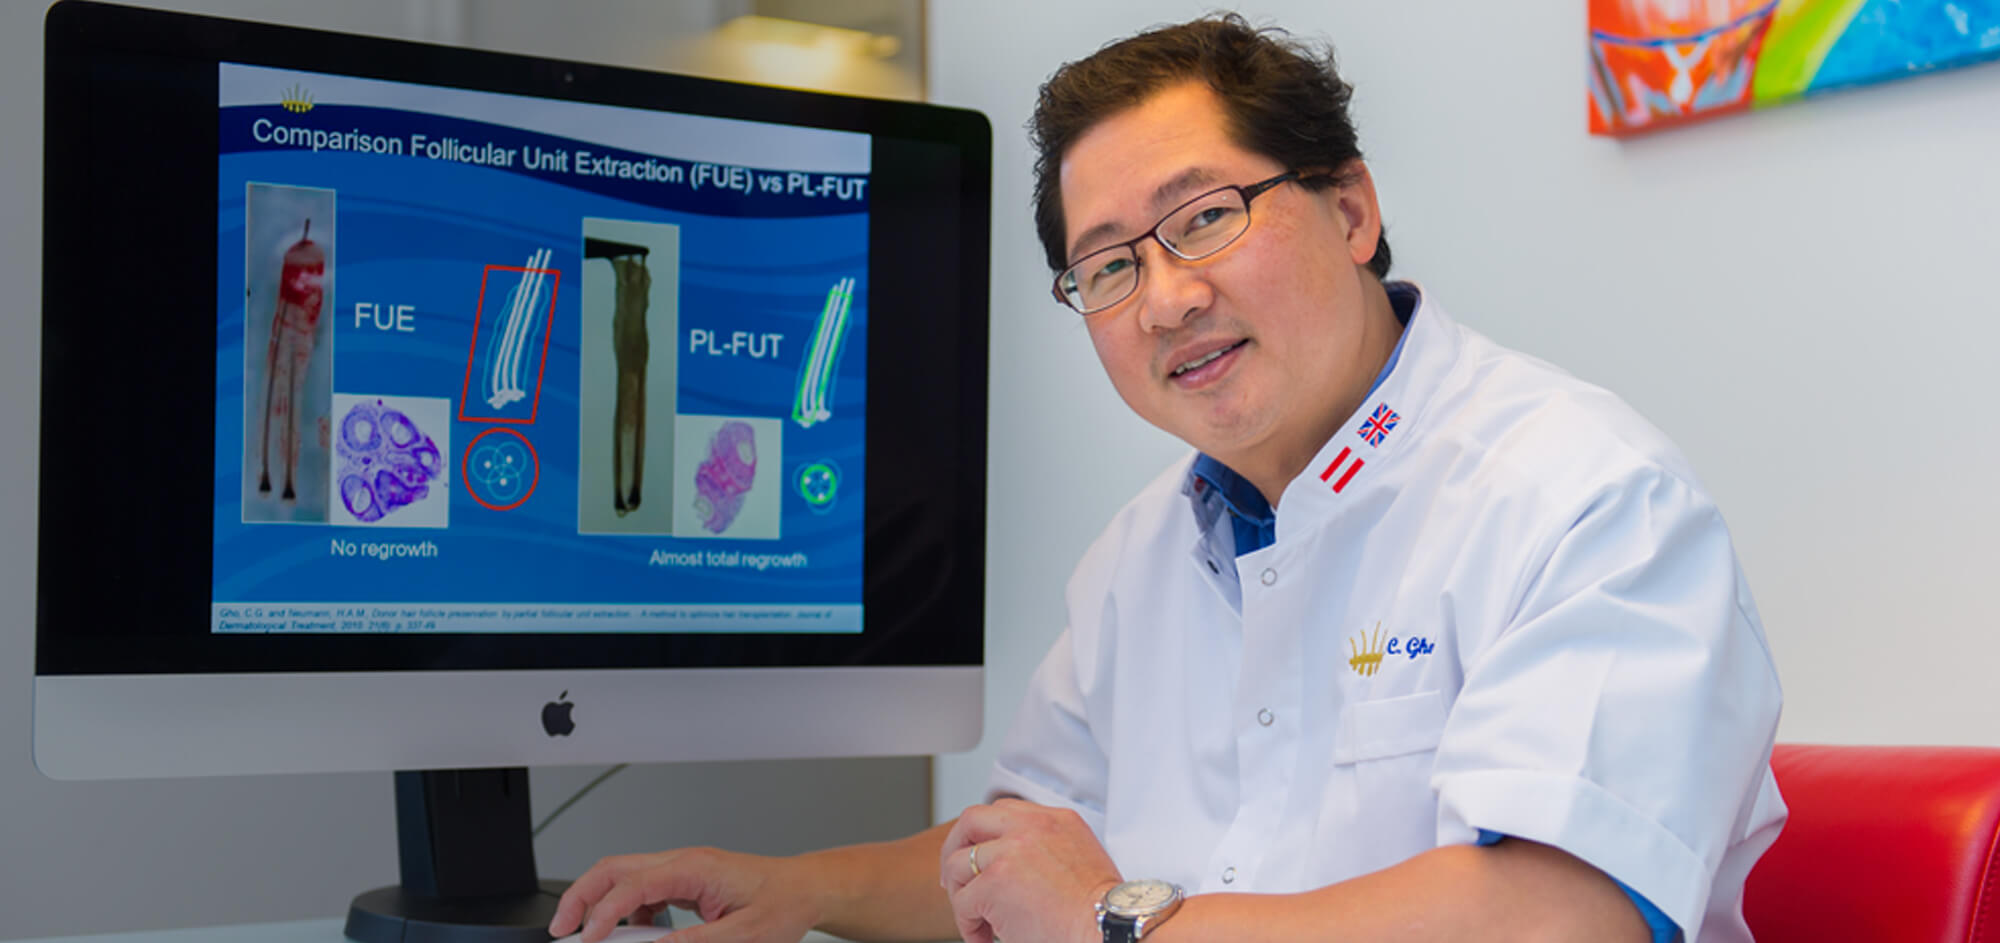 Drs. Coen Gho